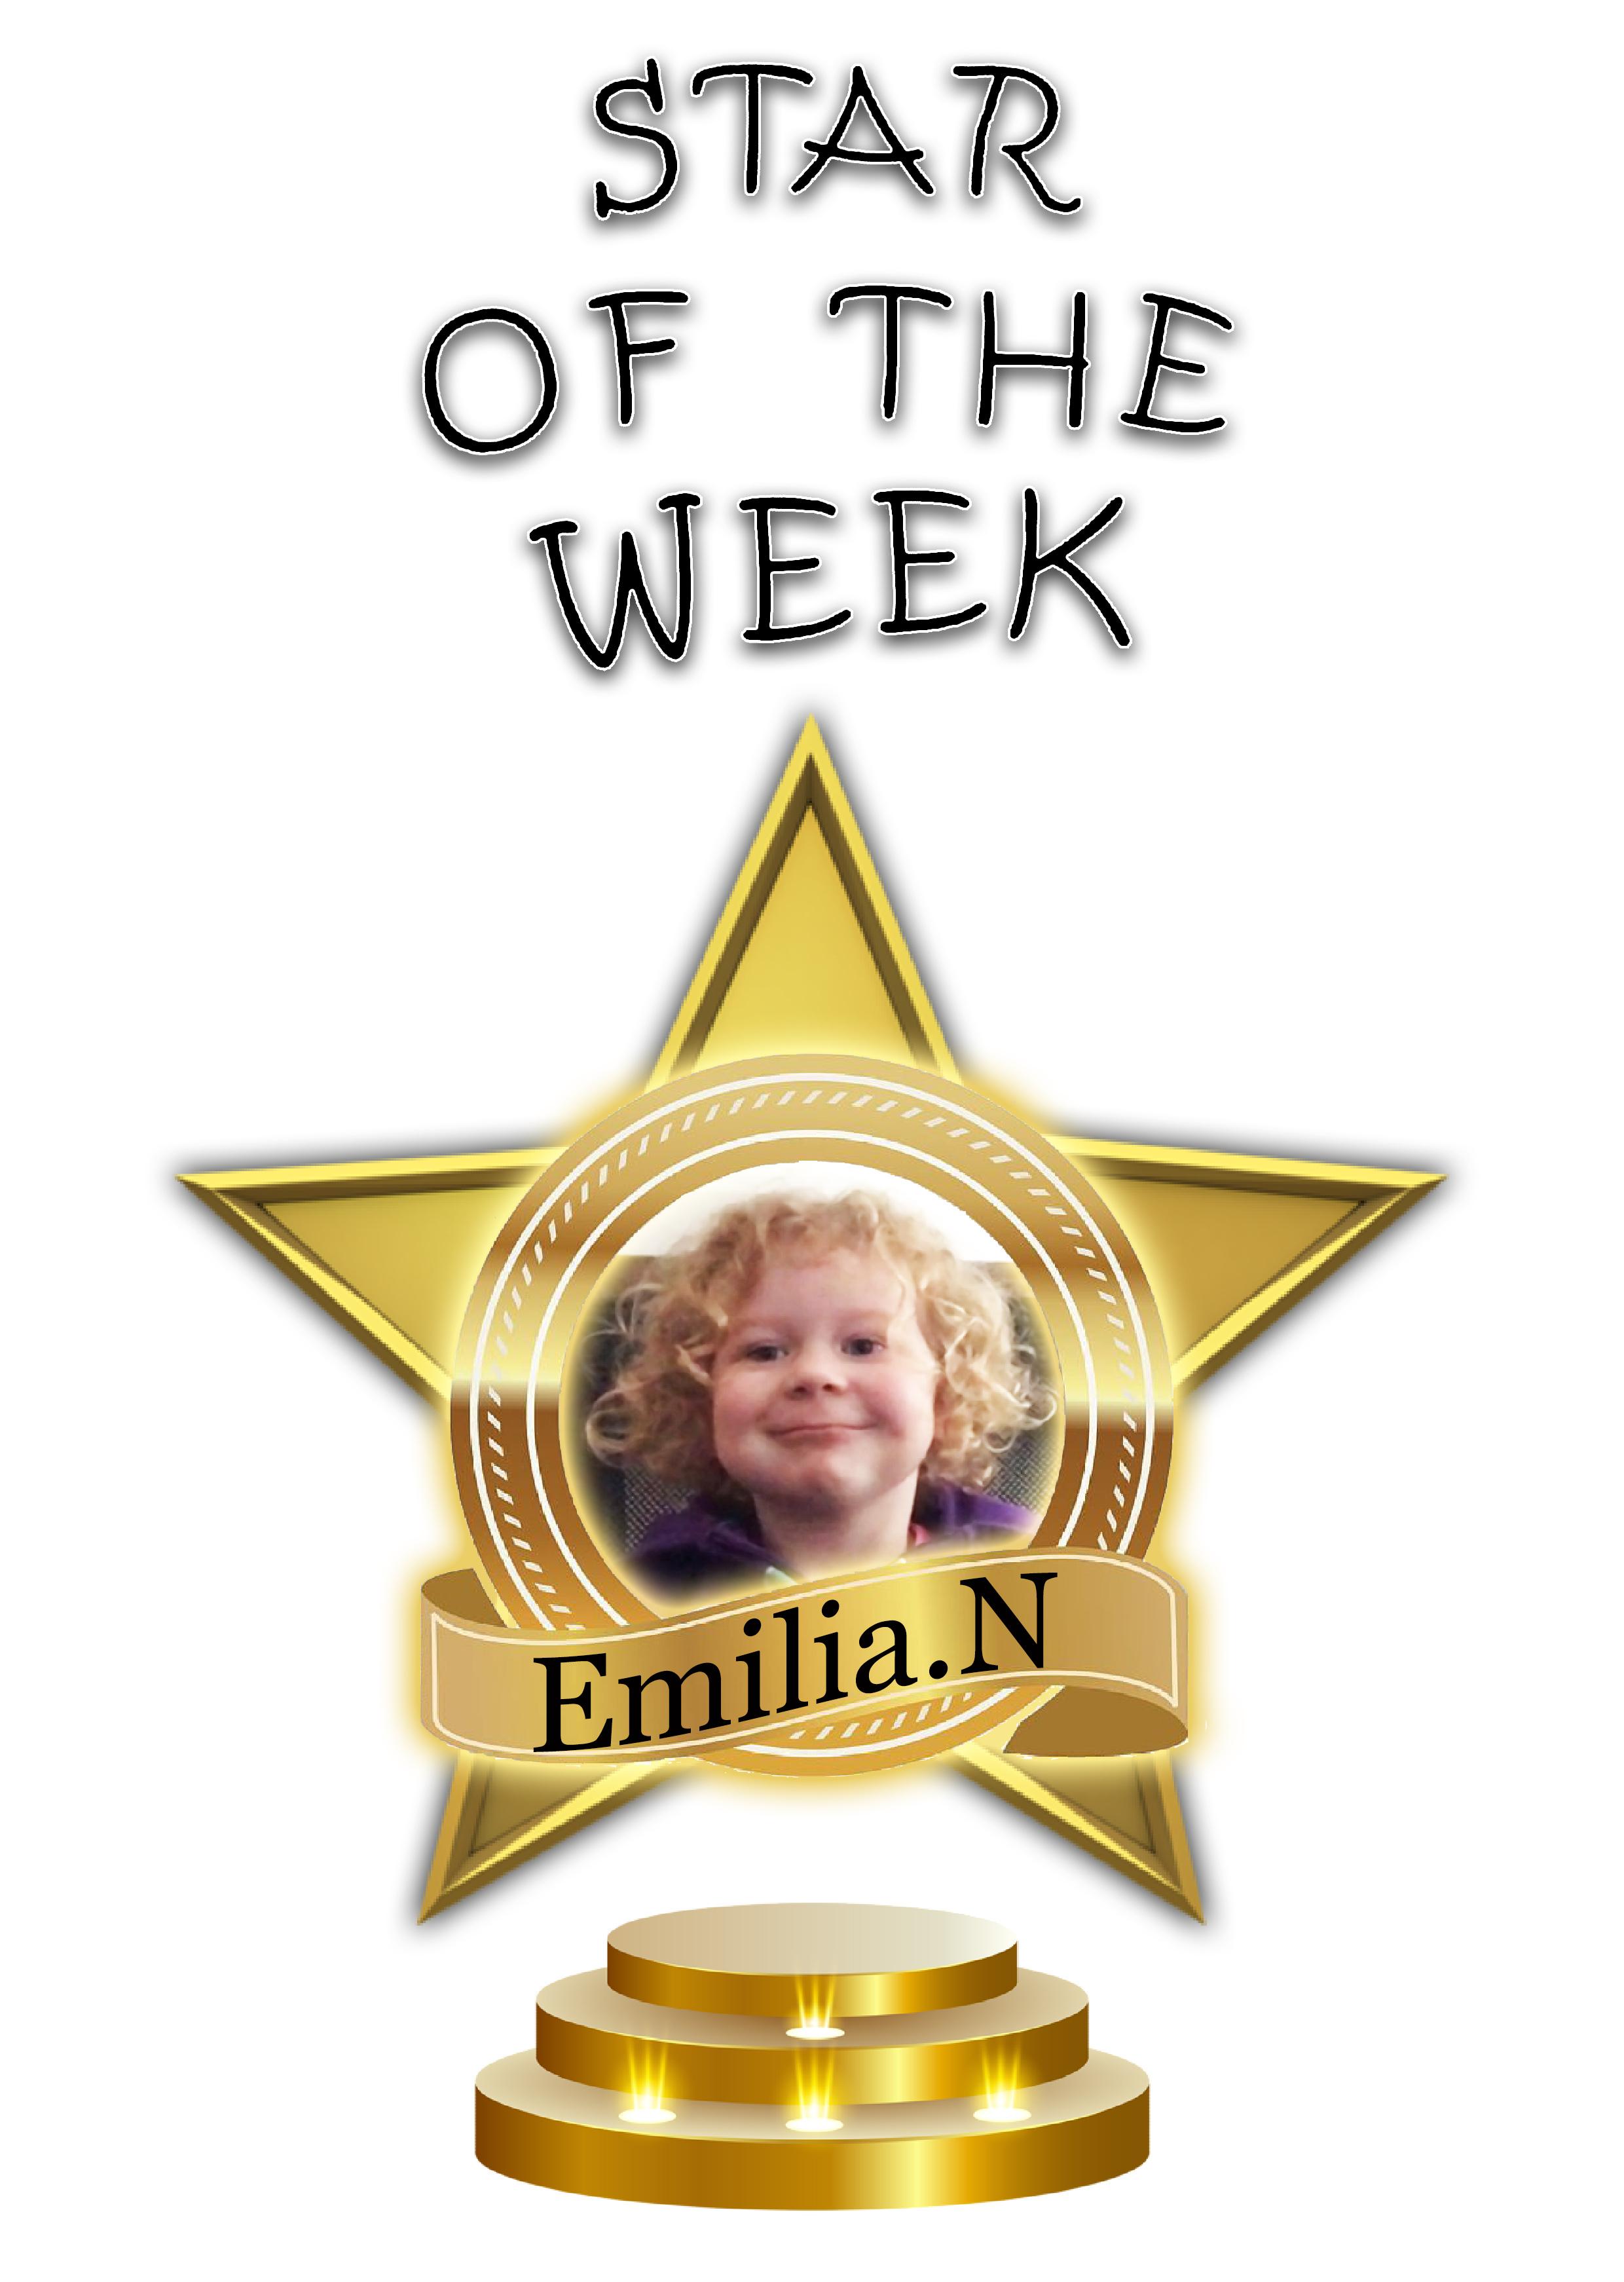 Emilia N